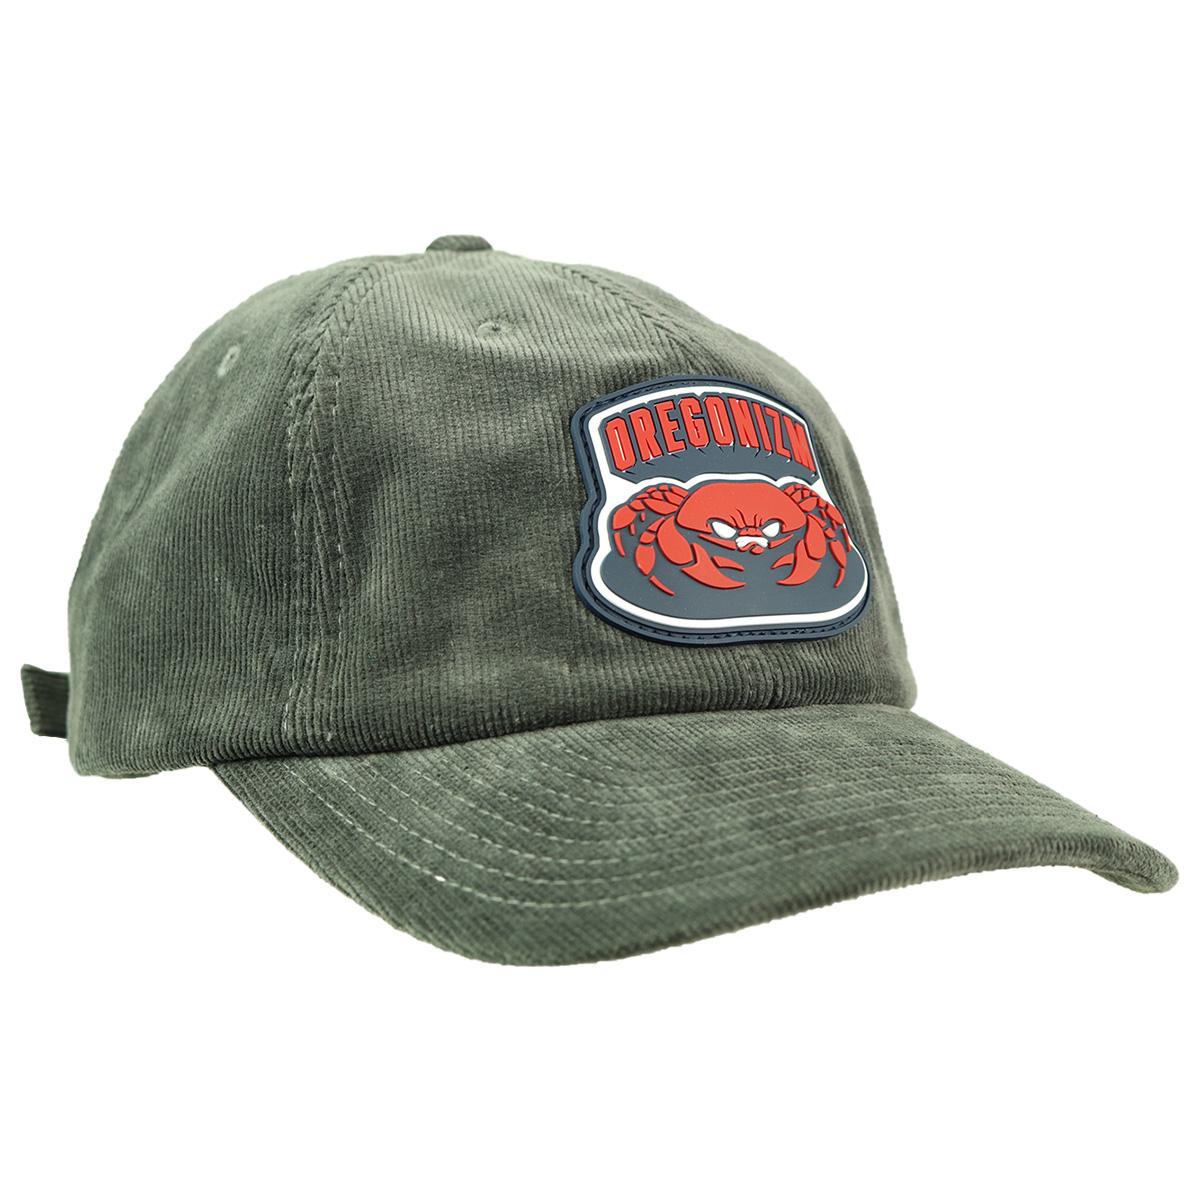 izm-productimage-hats-crabizm-courderoy-grey-primary